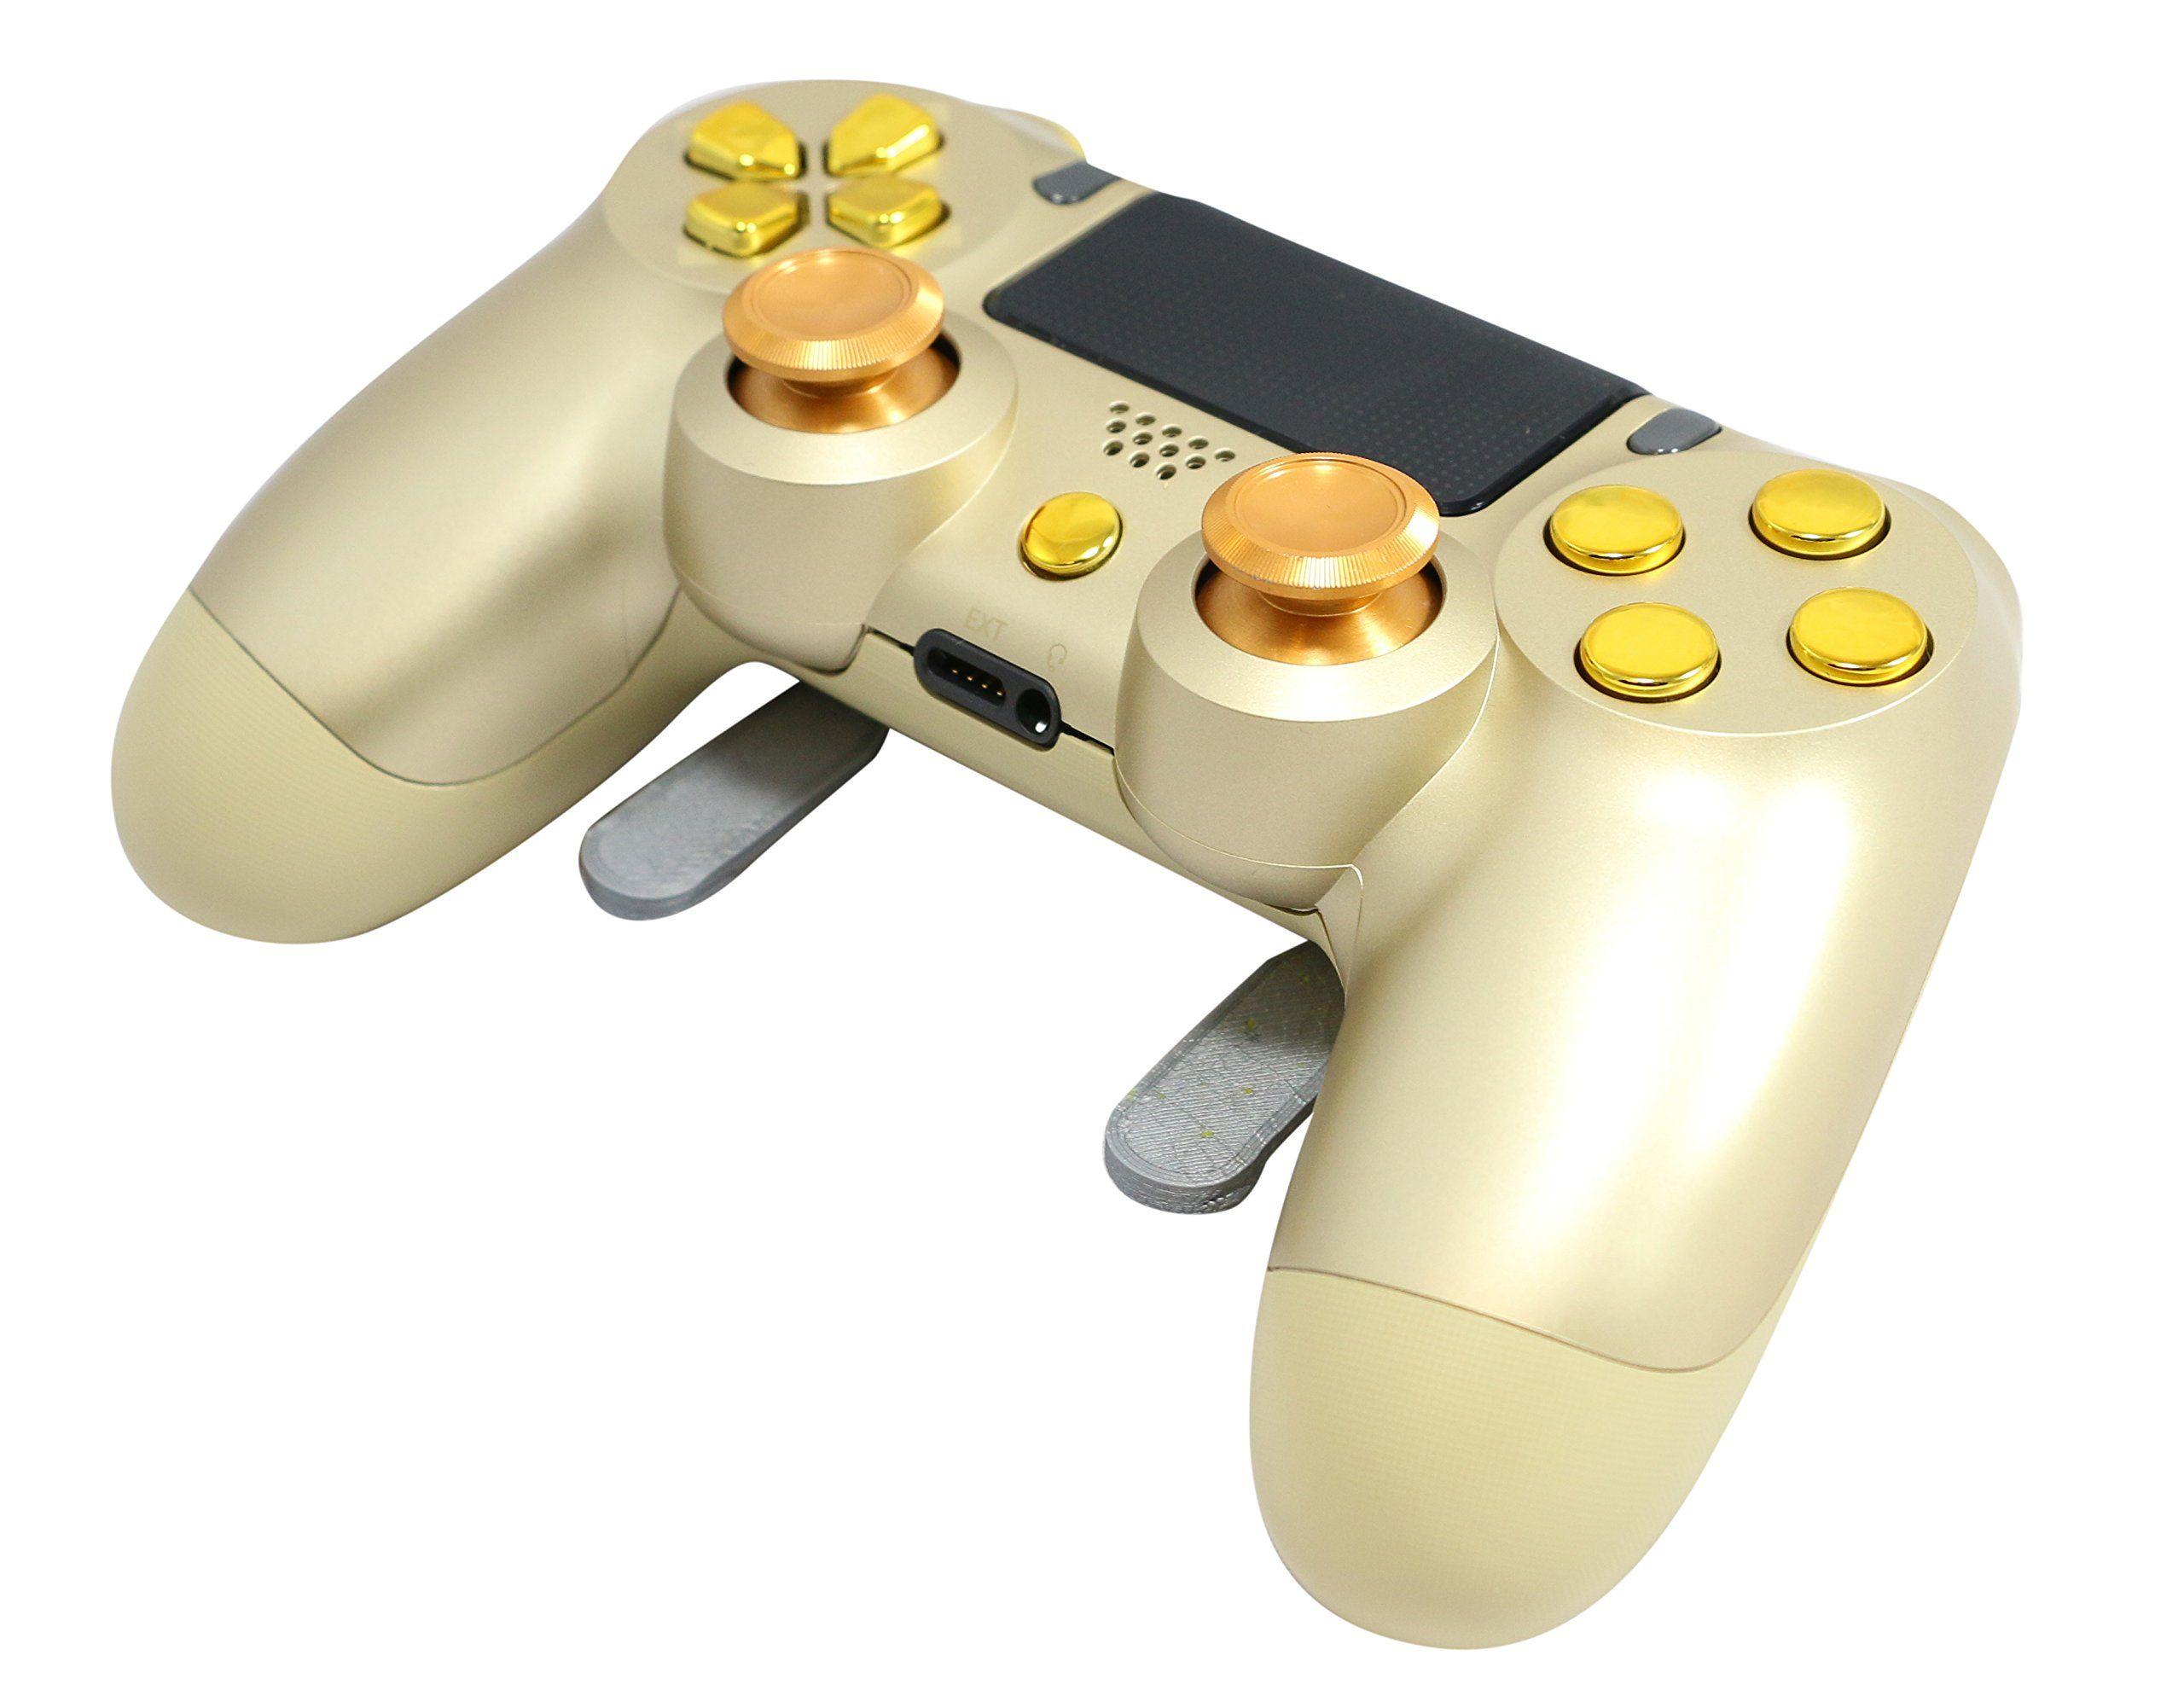 Gold/Chrome Gold PS4 Elite Controller Custom Paddles Trigger